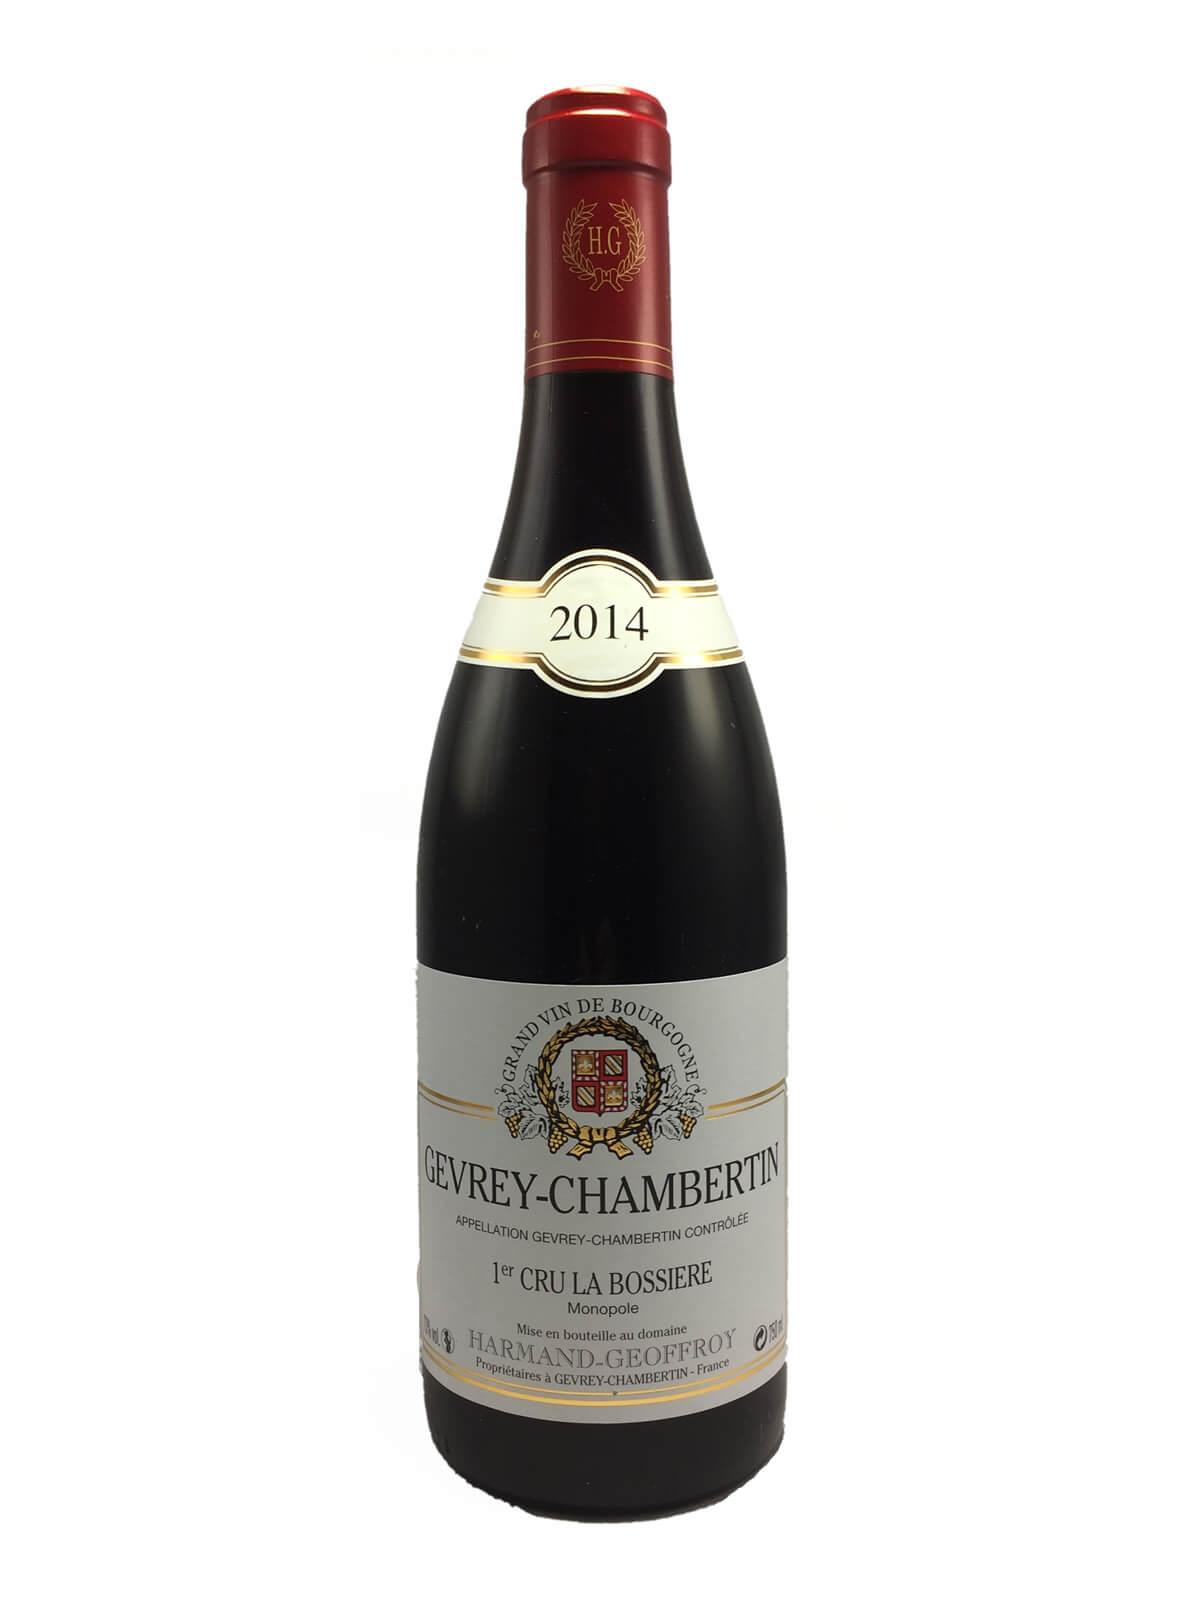 GEVREY CHAMBERTIN 1er Cru La Bossière 2014 Domaine HARMAND